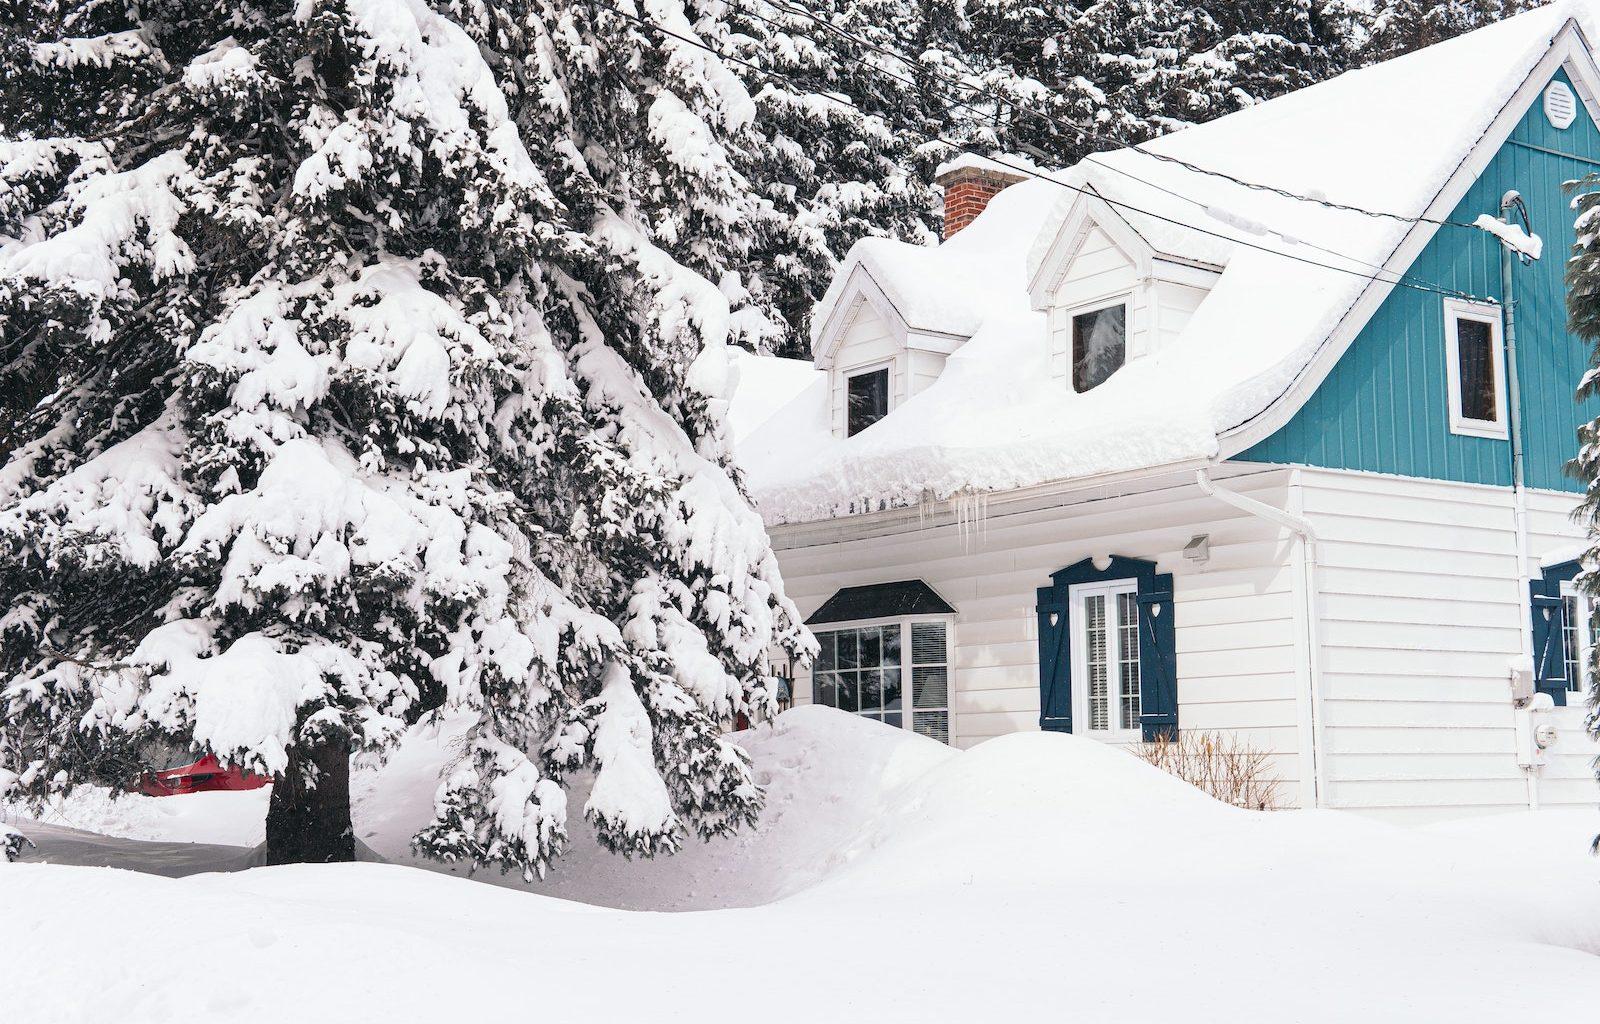 Snow removal around a house